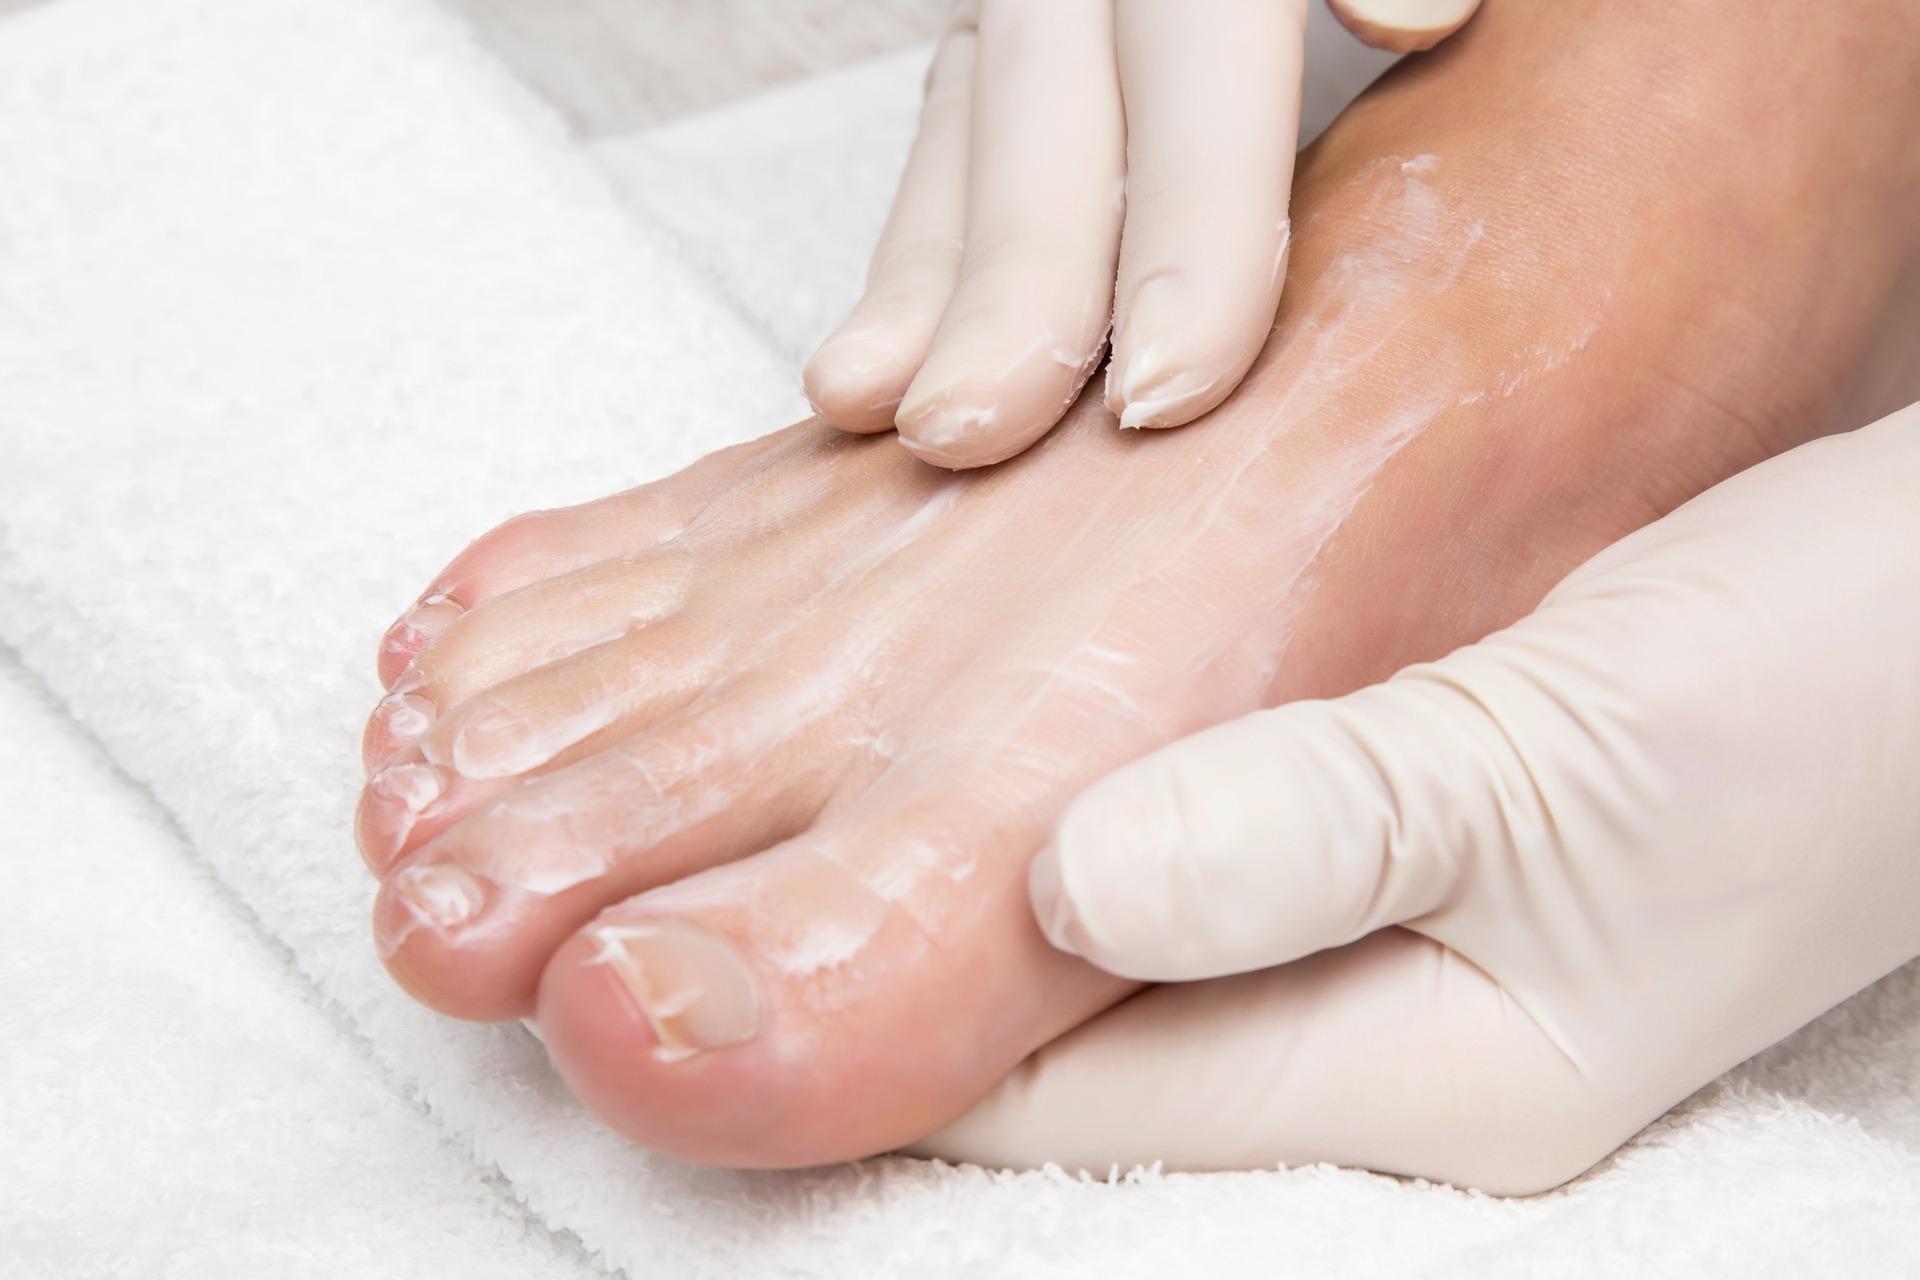 Рецепты пилинга ног в домашних условиях